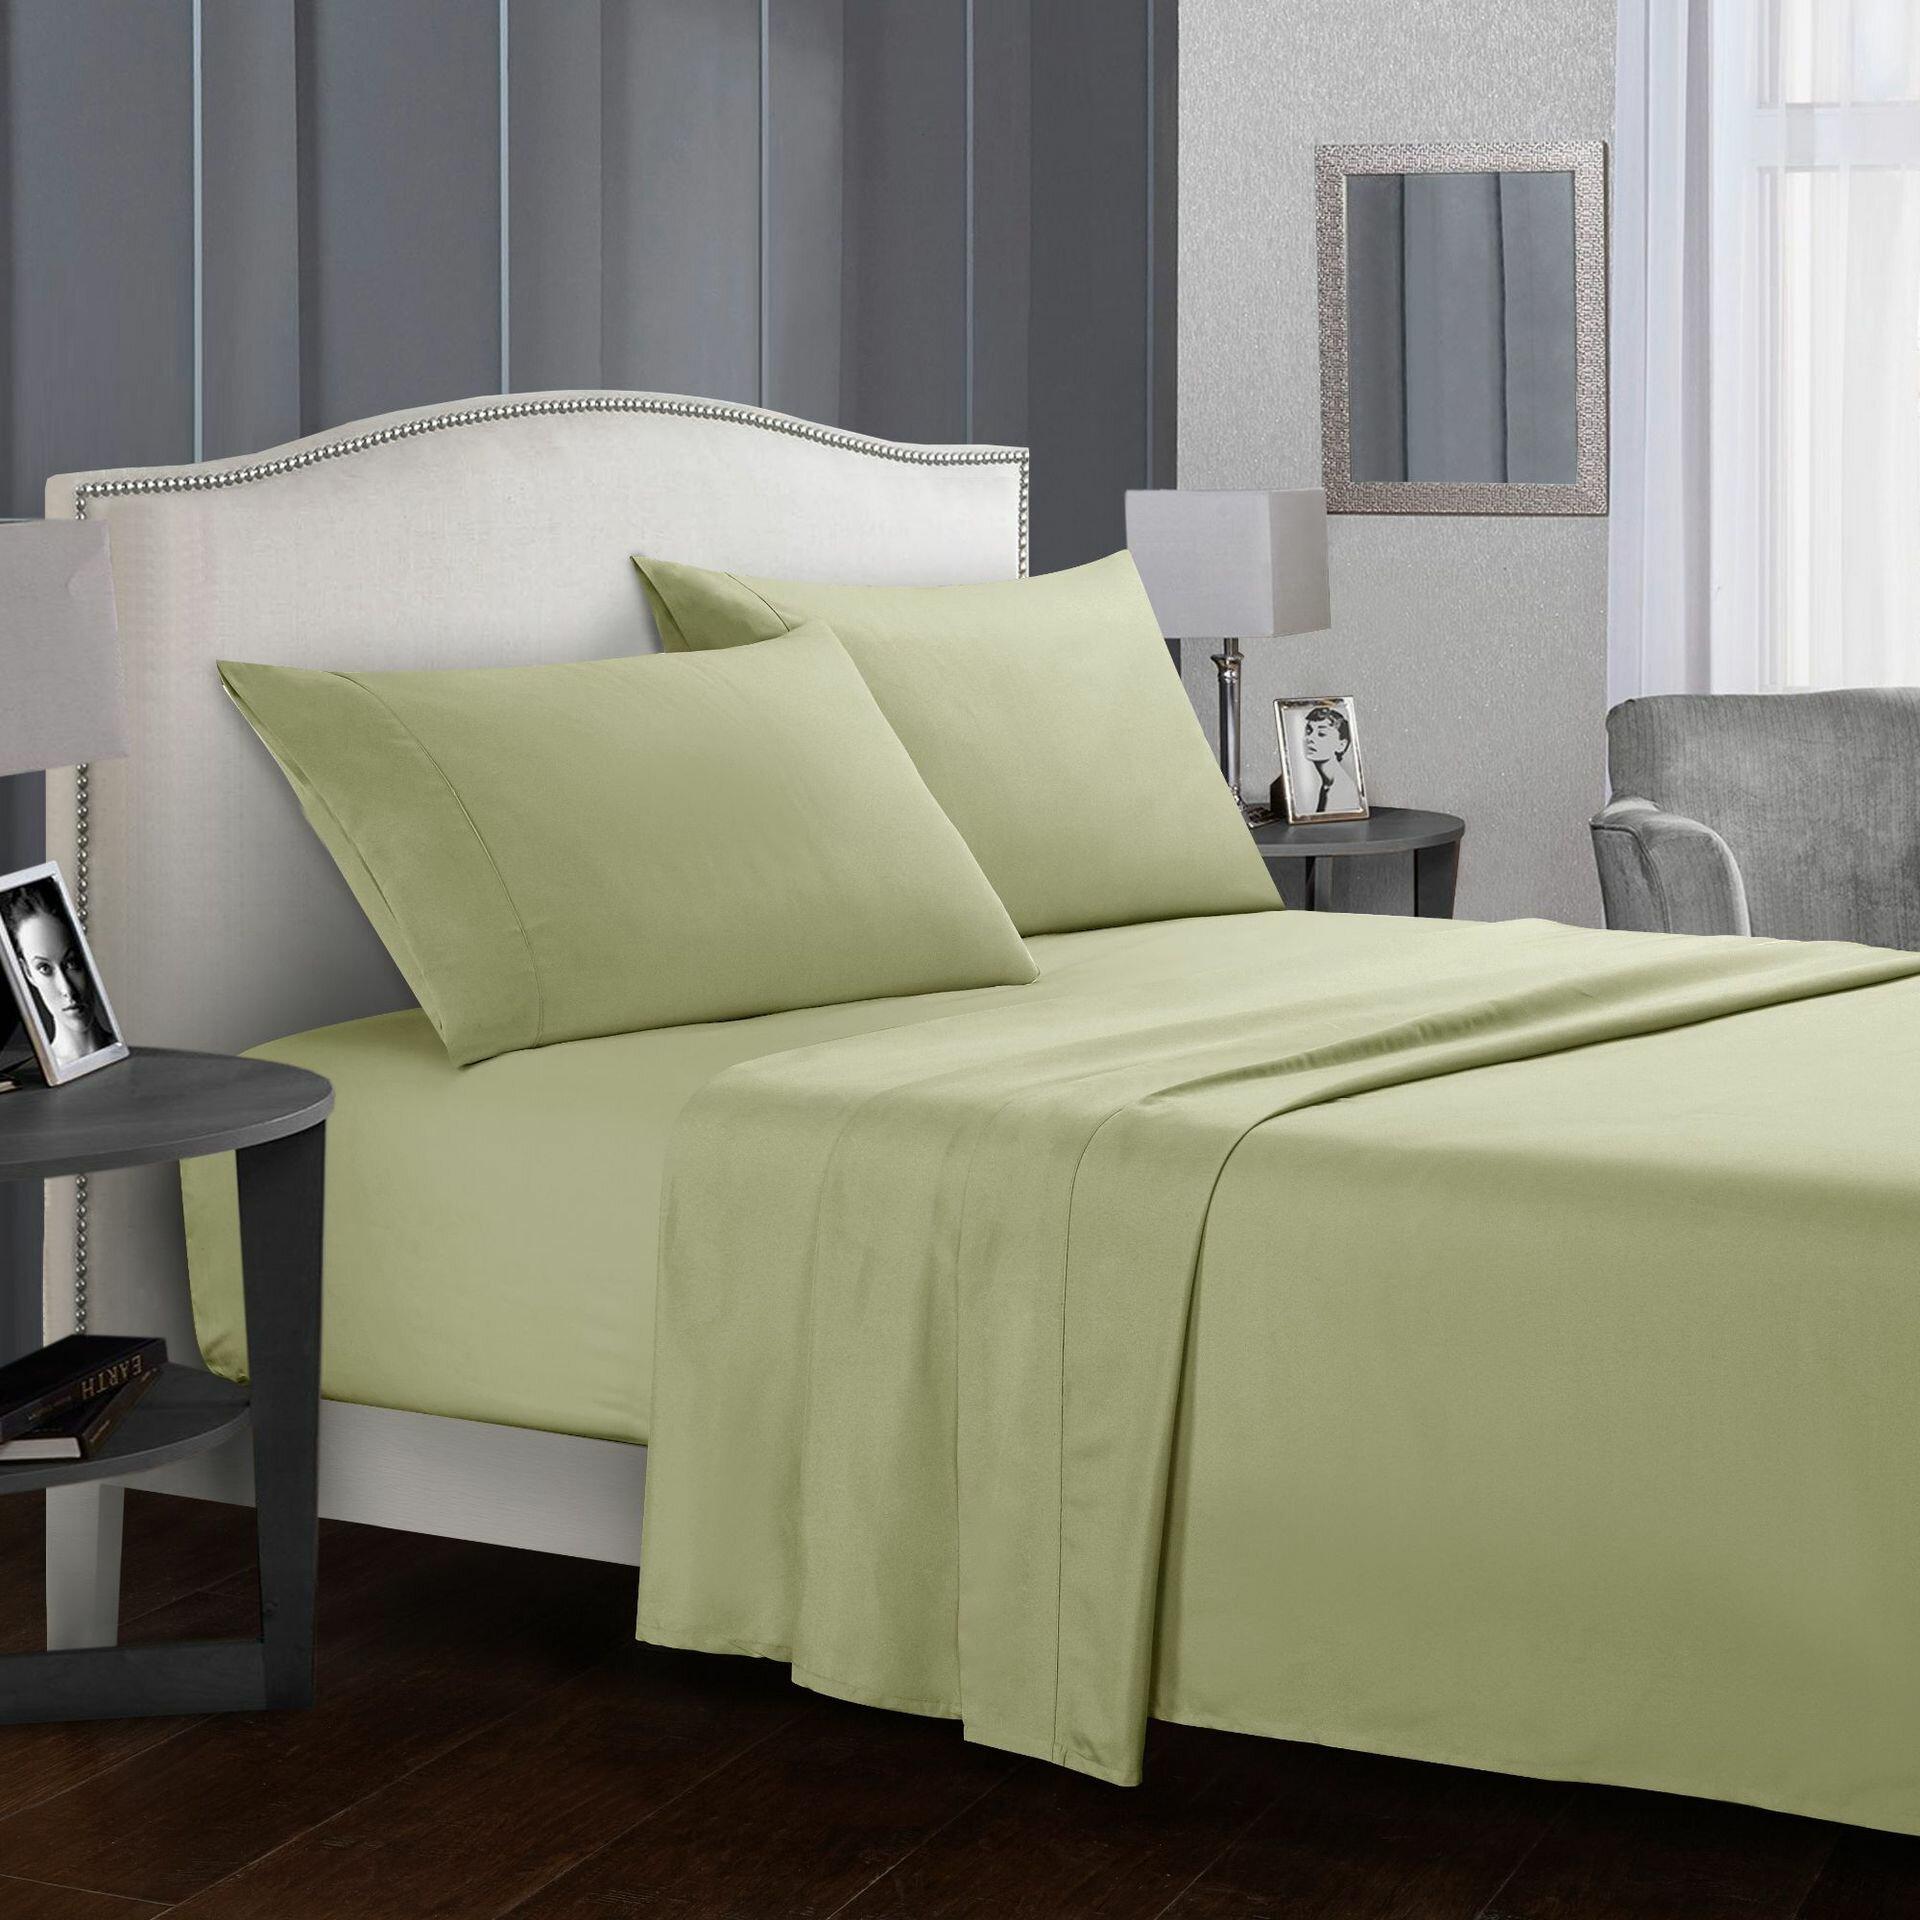 Hotel Luxury Comfort Bed Sheets Set Bedding Set Deep Pockets Wrinkle & Fade Resistant Hypoallergenic Sheet & Pillow Case